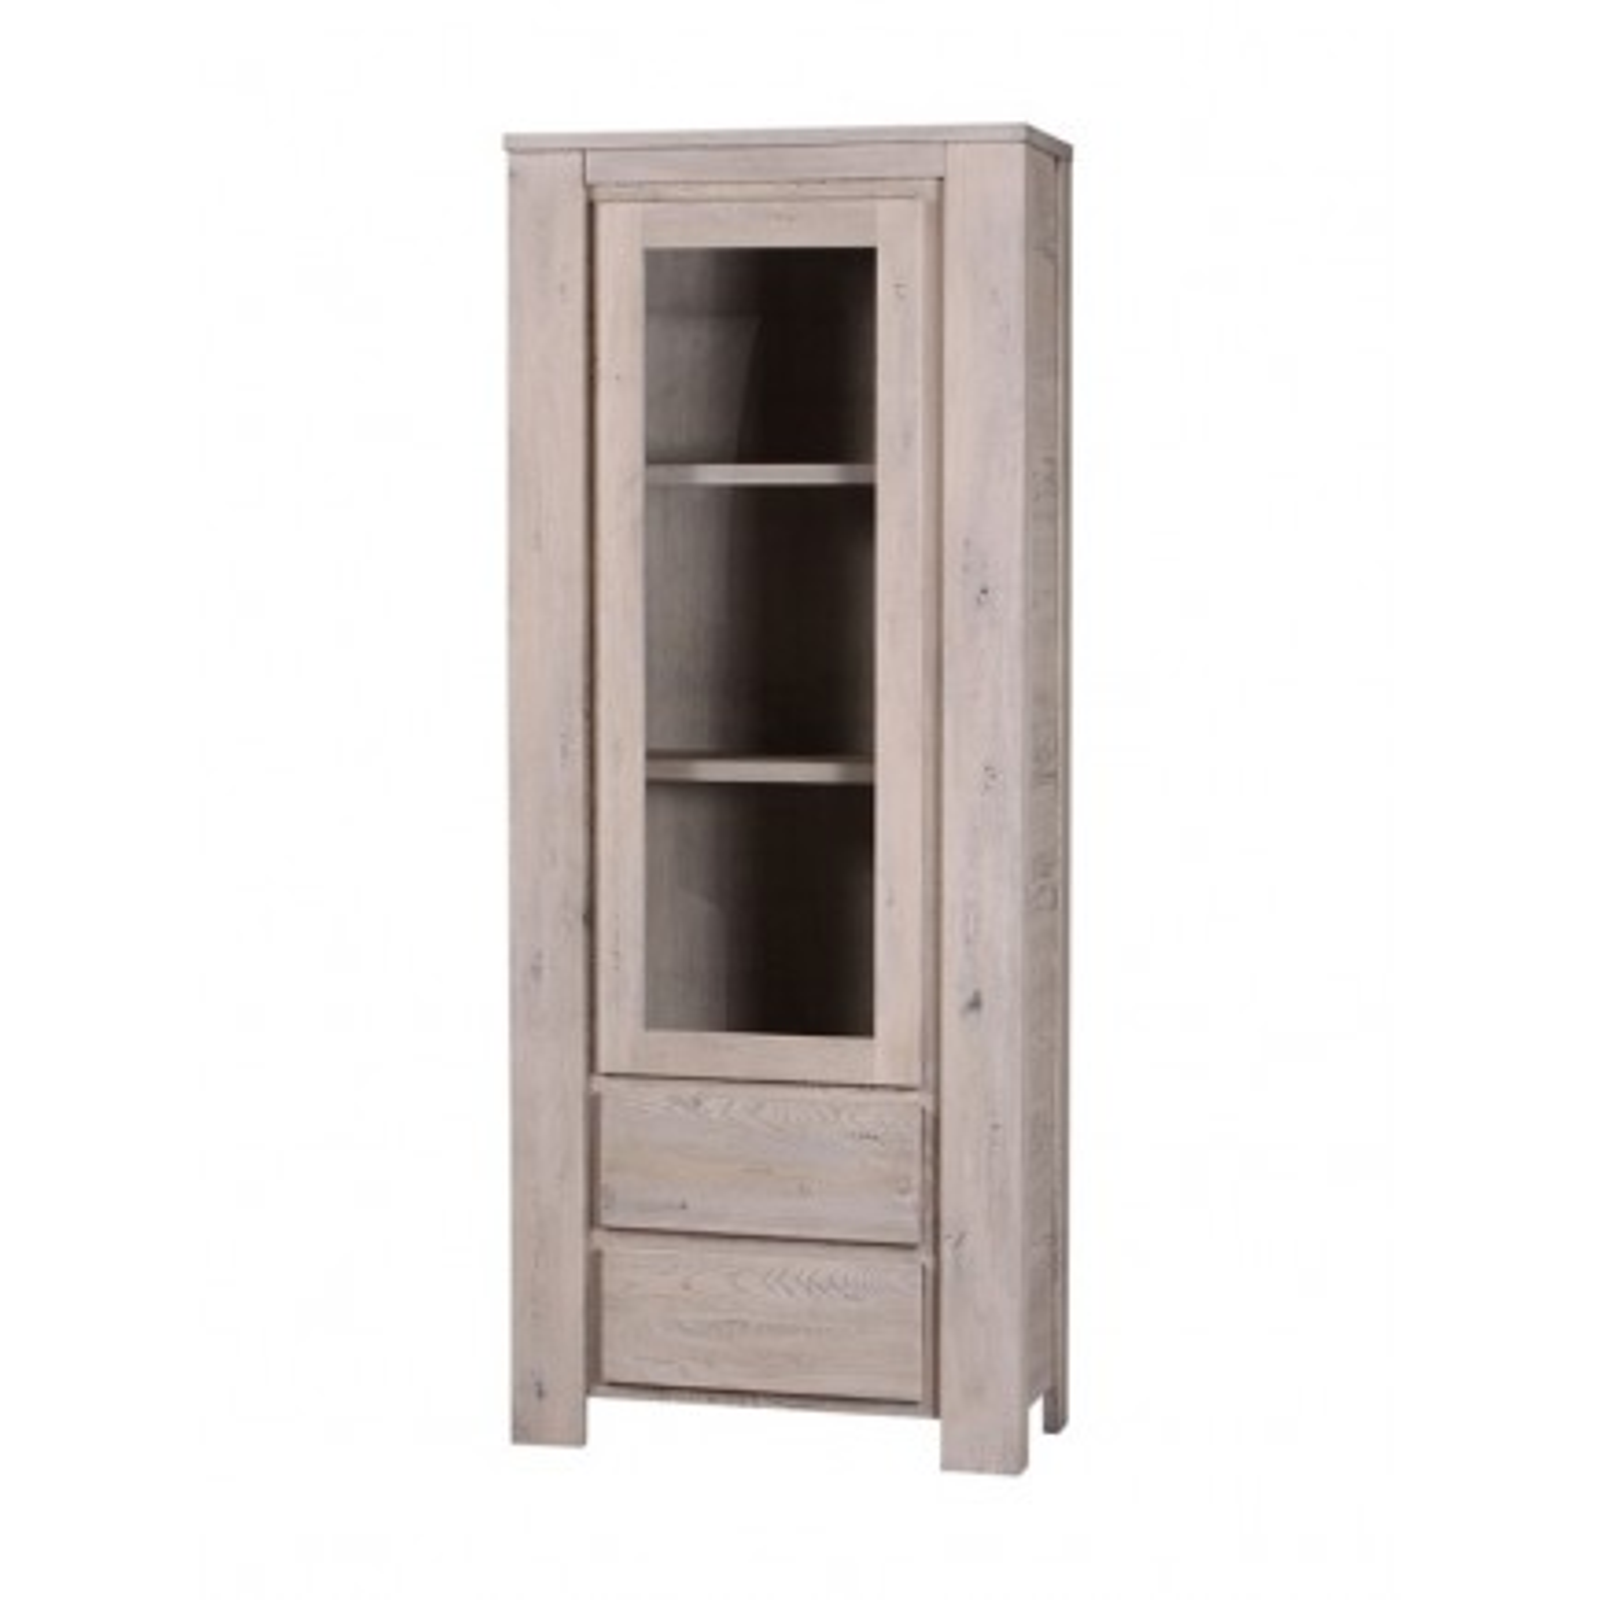 Bibliothèque Vitrée Milena Grigia Chêne - meuble style design